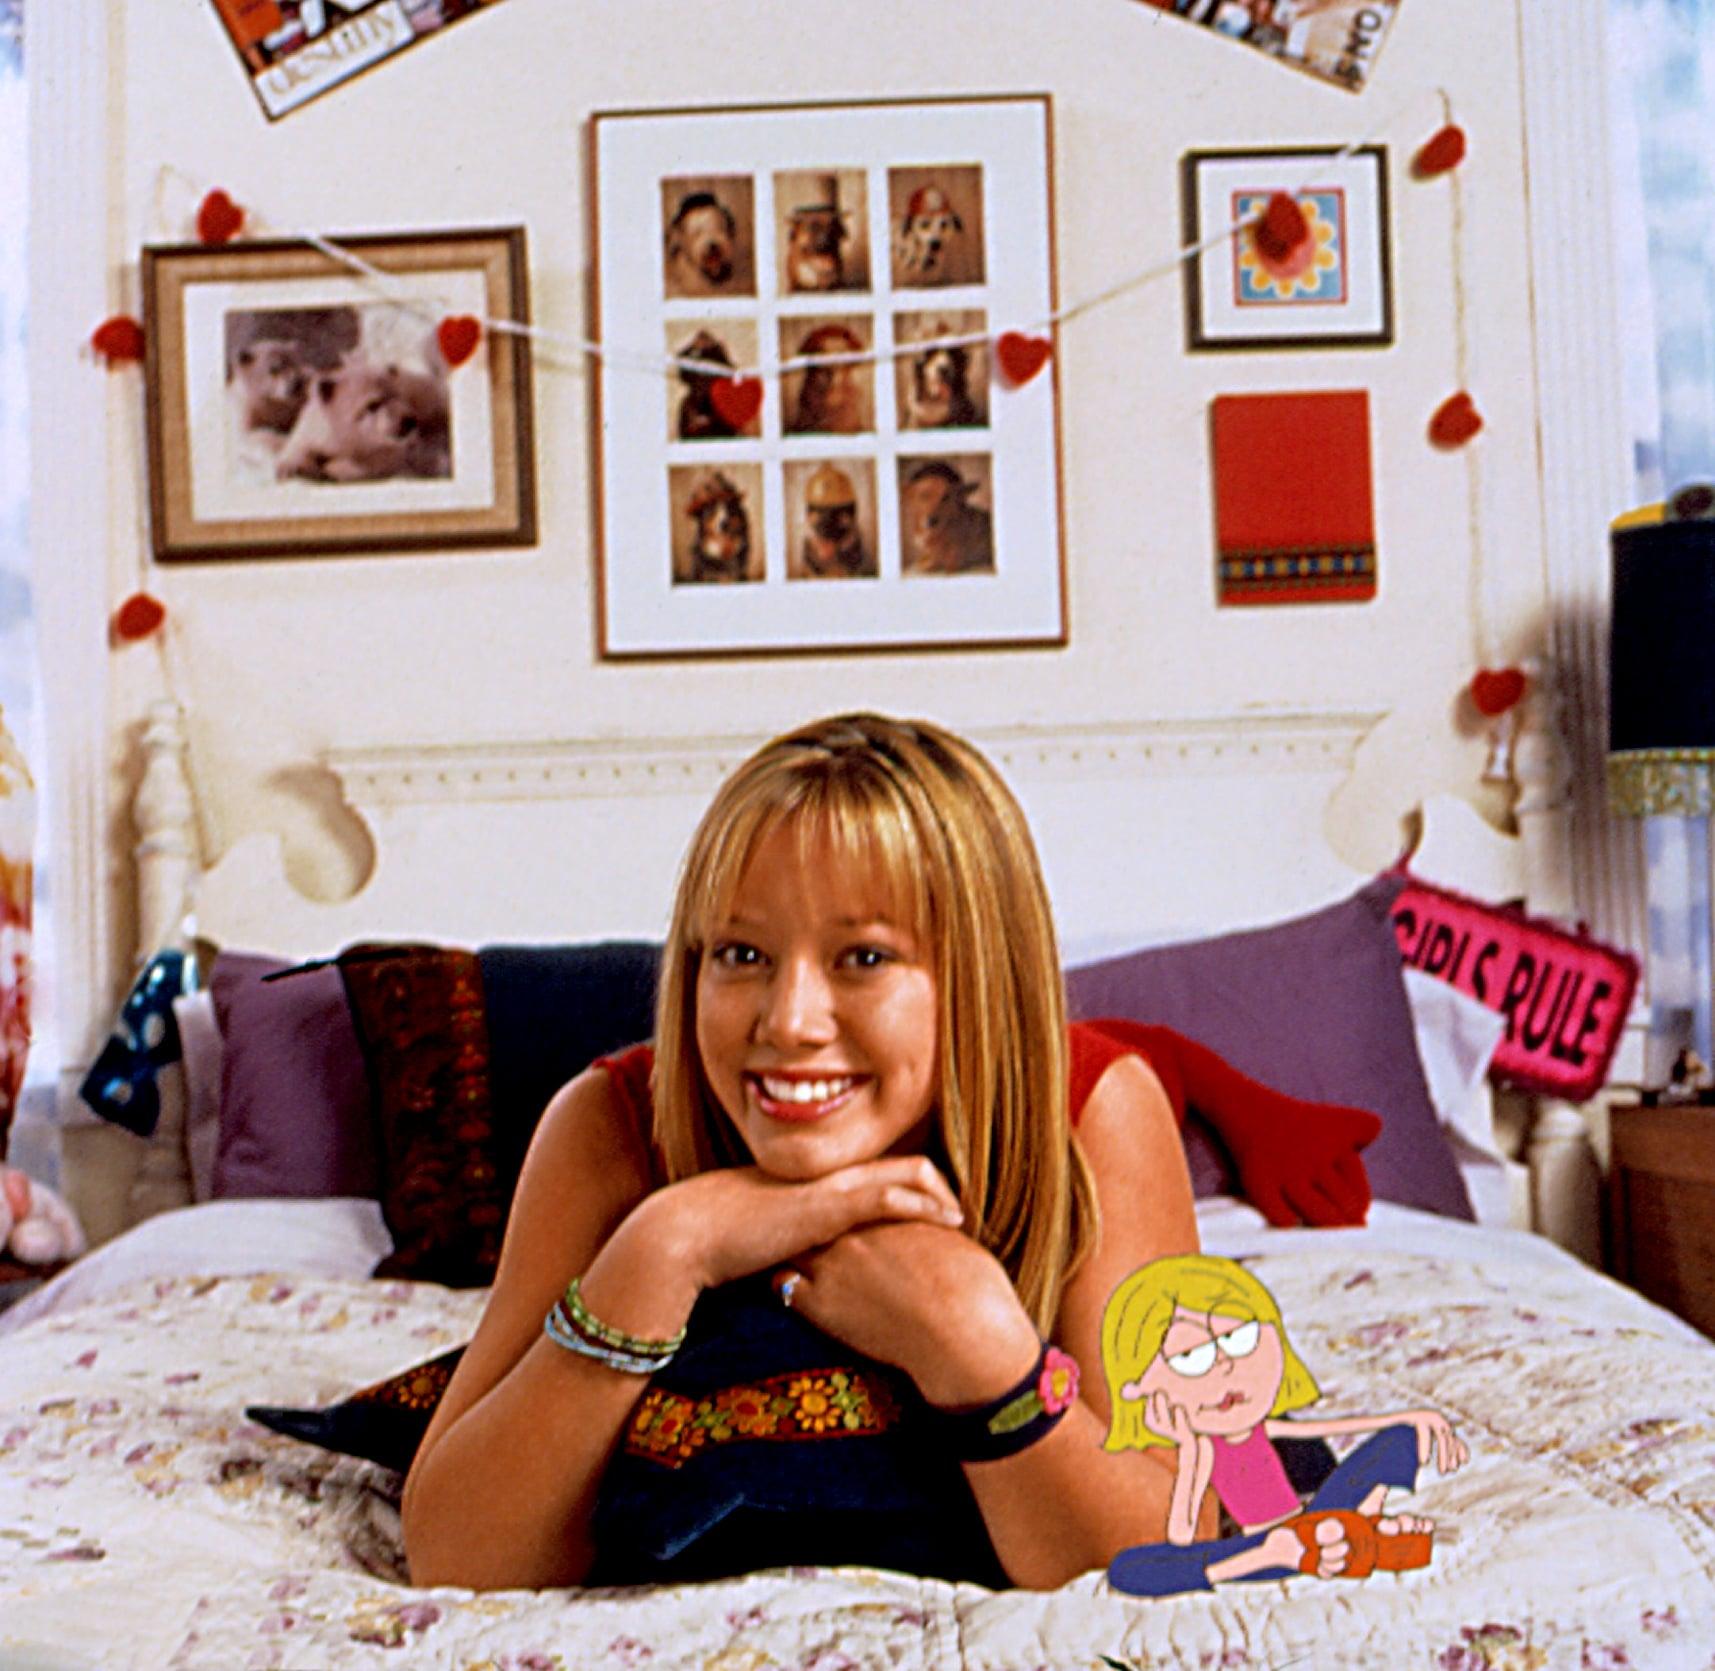 LIZZIE MCGUIRE, Hilary Duff, 2001-03